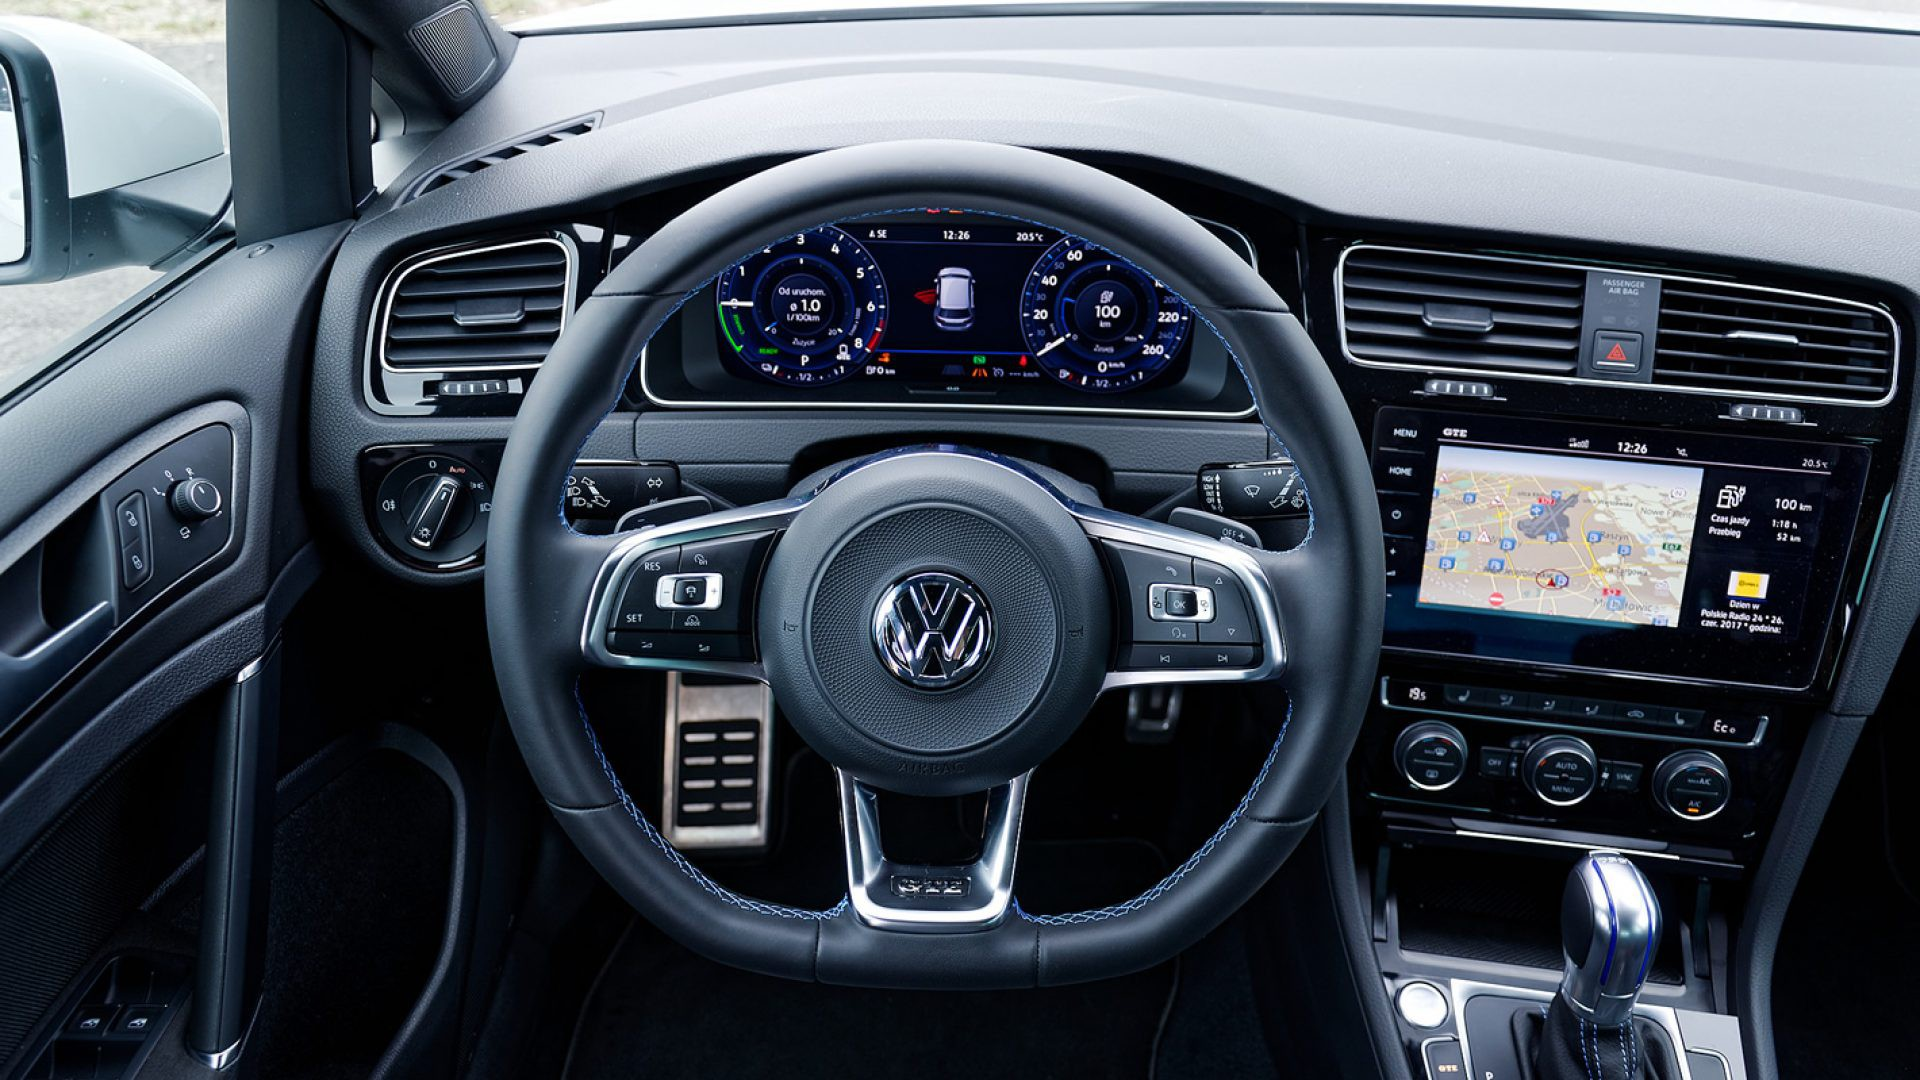 Volkswagen Golf GTE - wygodna kierownica